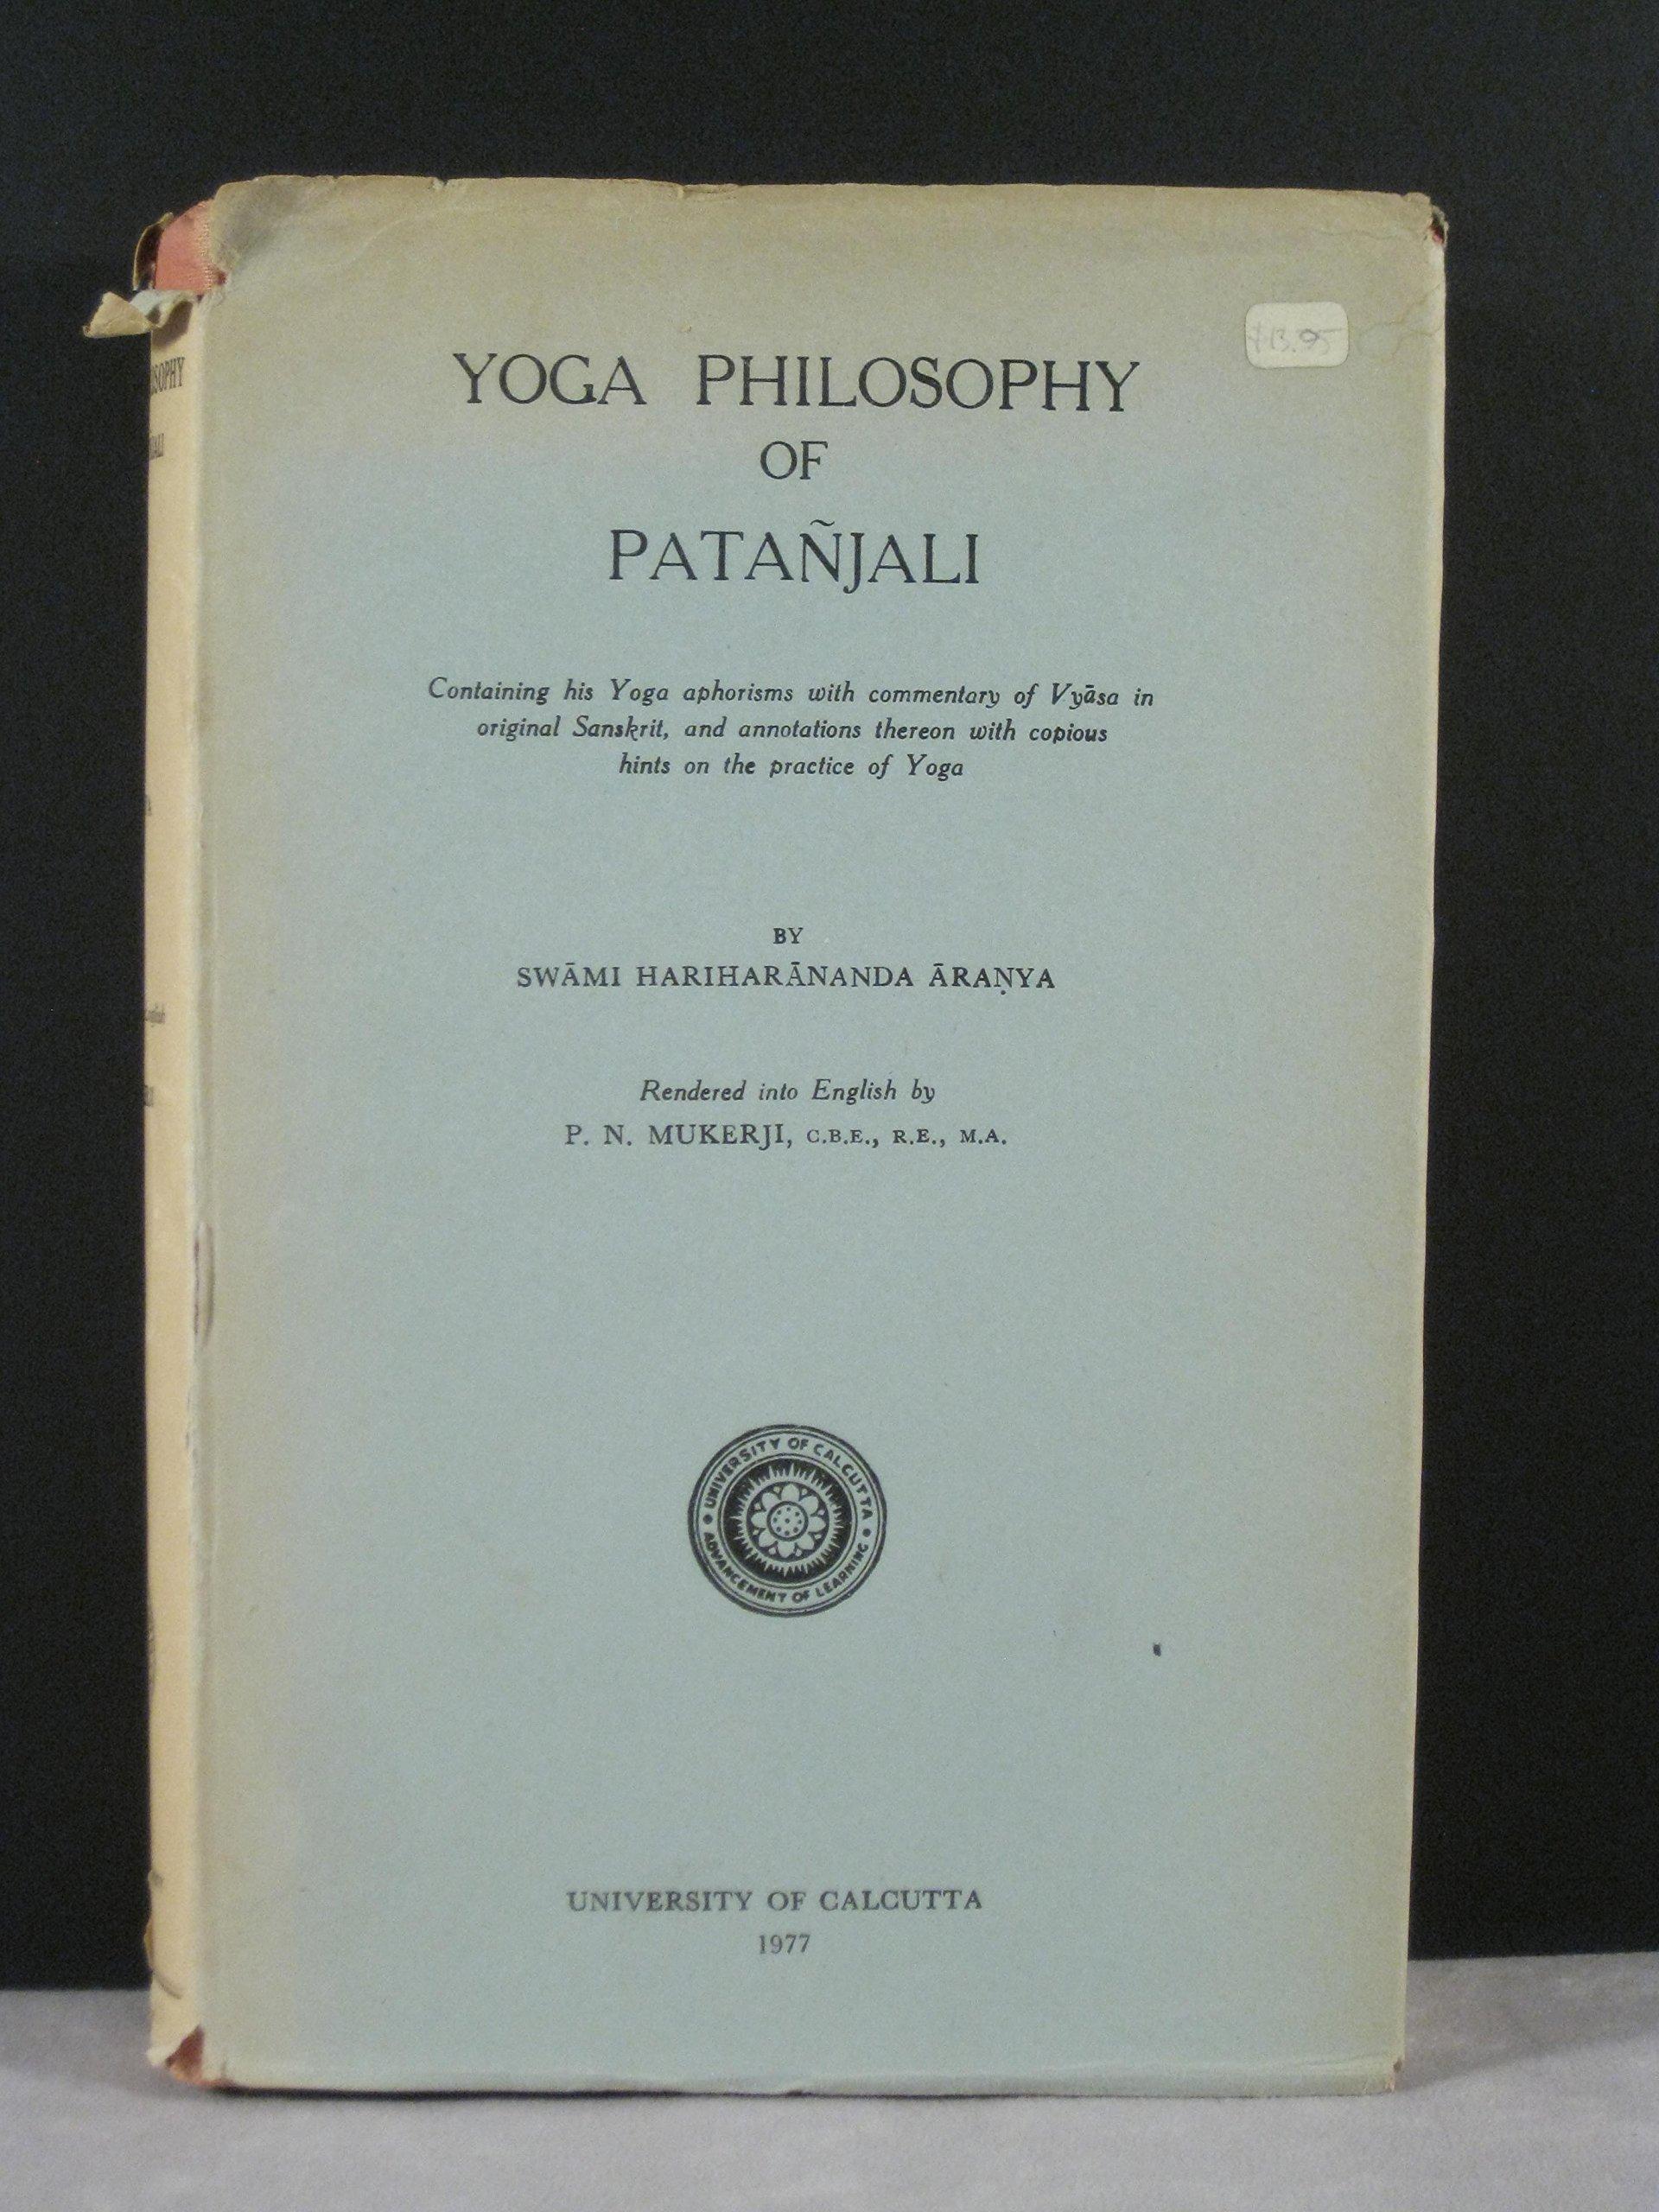 Yoga Philosophy Of Patanjali Swami Hariharananda Aranya P N Mukherji Amazon Com Books